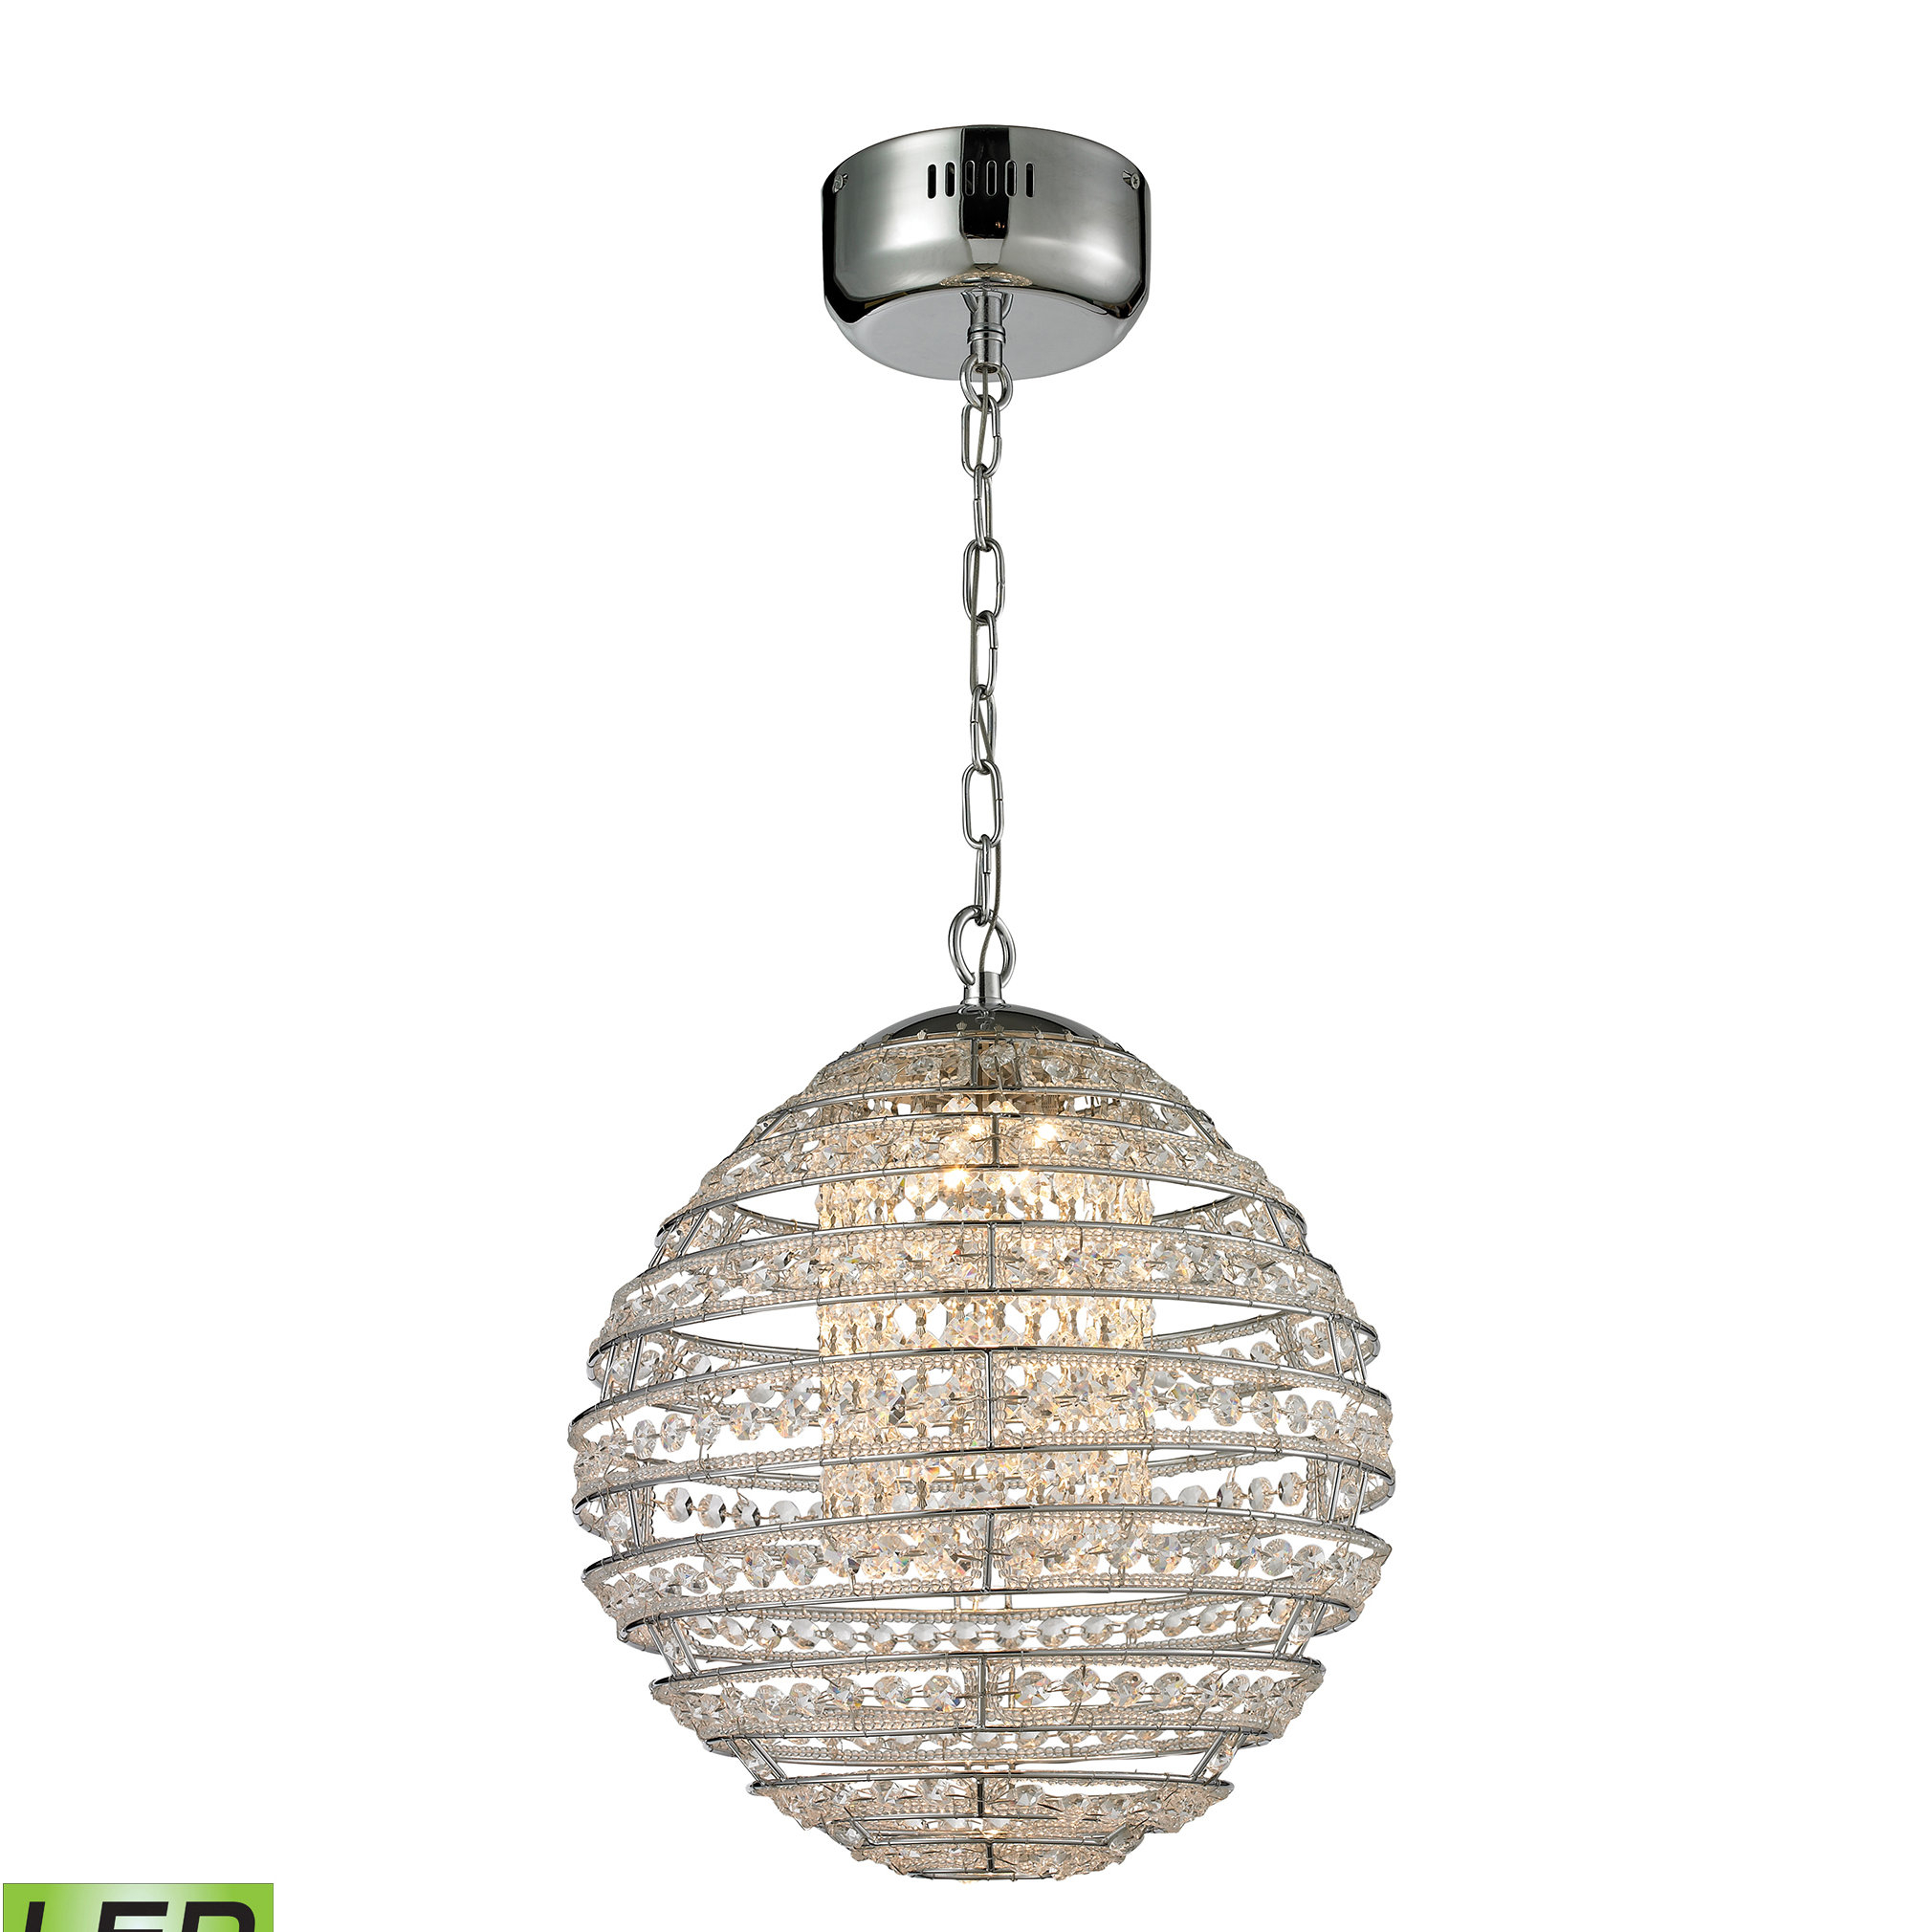 Tussey 1-Light Led Single Globe Pendant within Hermione 1-Light Single Drum Pendants (Image 26 of 30)